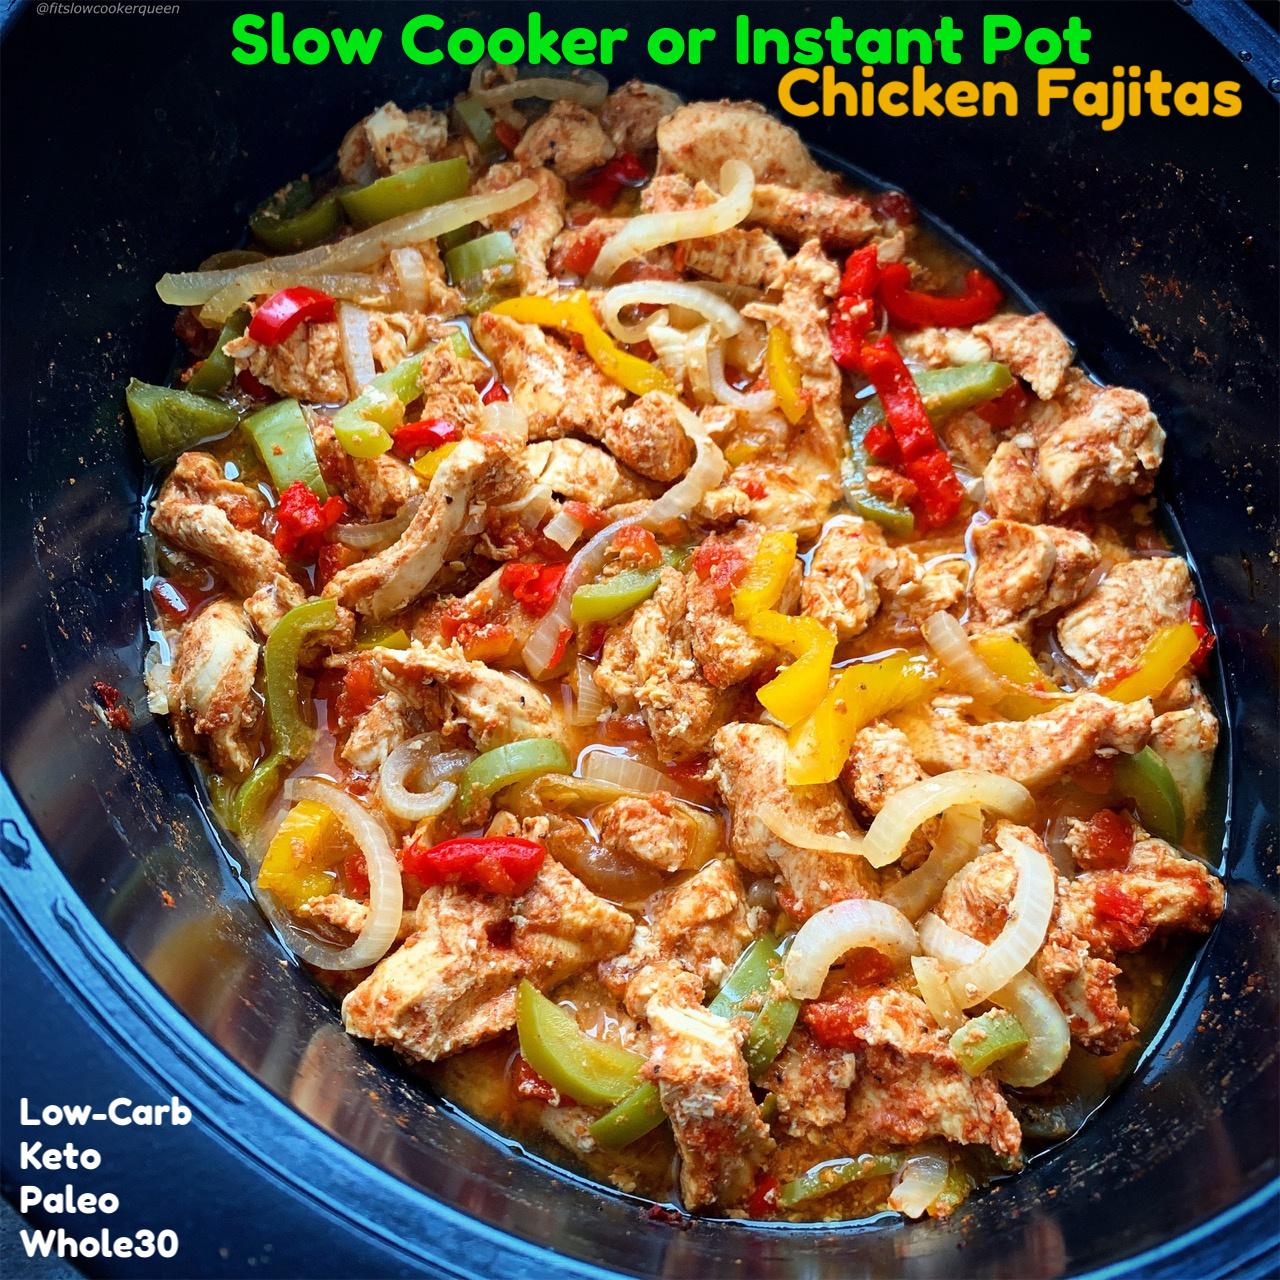 {VIDEO} Slow Cooker/Instant Pot Chicken Fajitas (Low-Carb